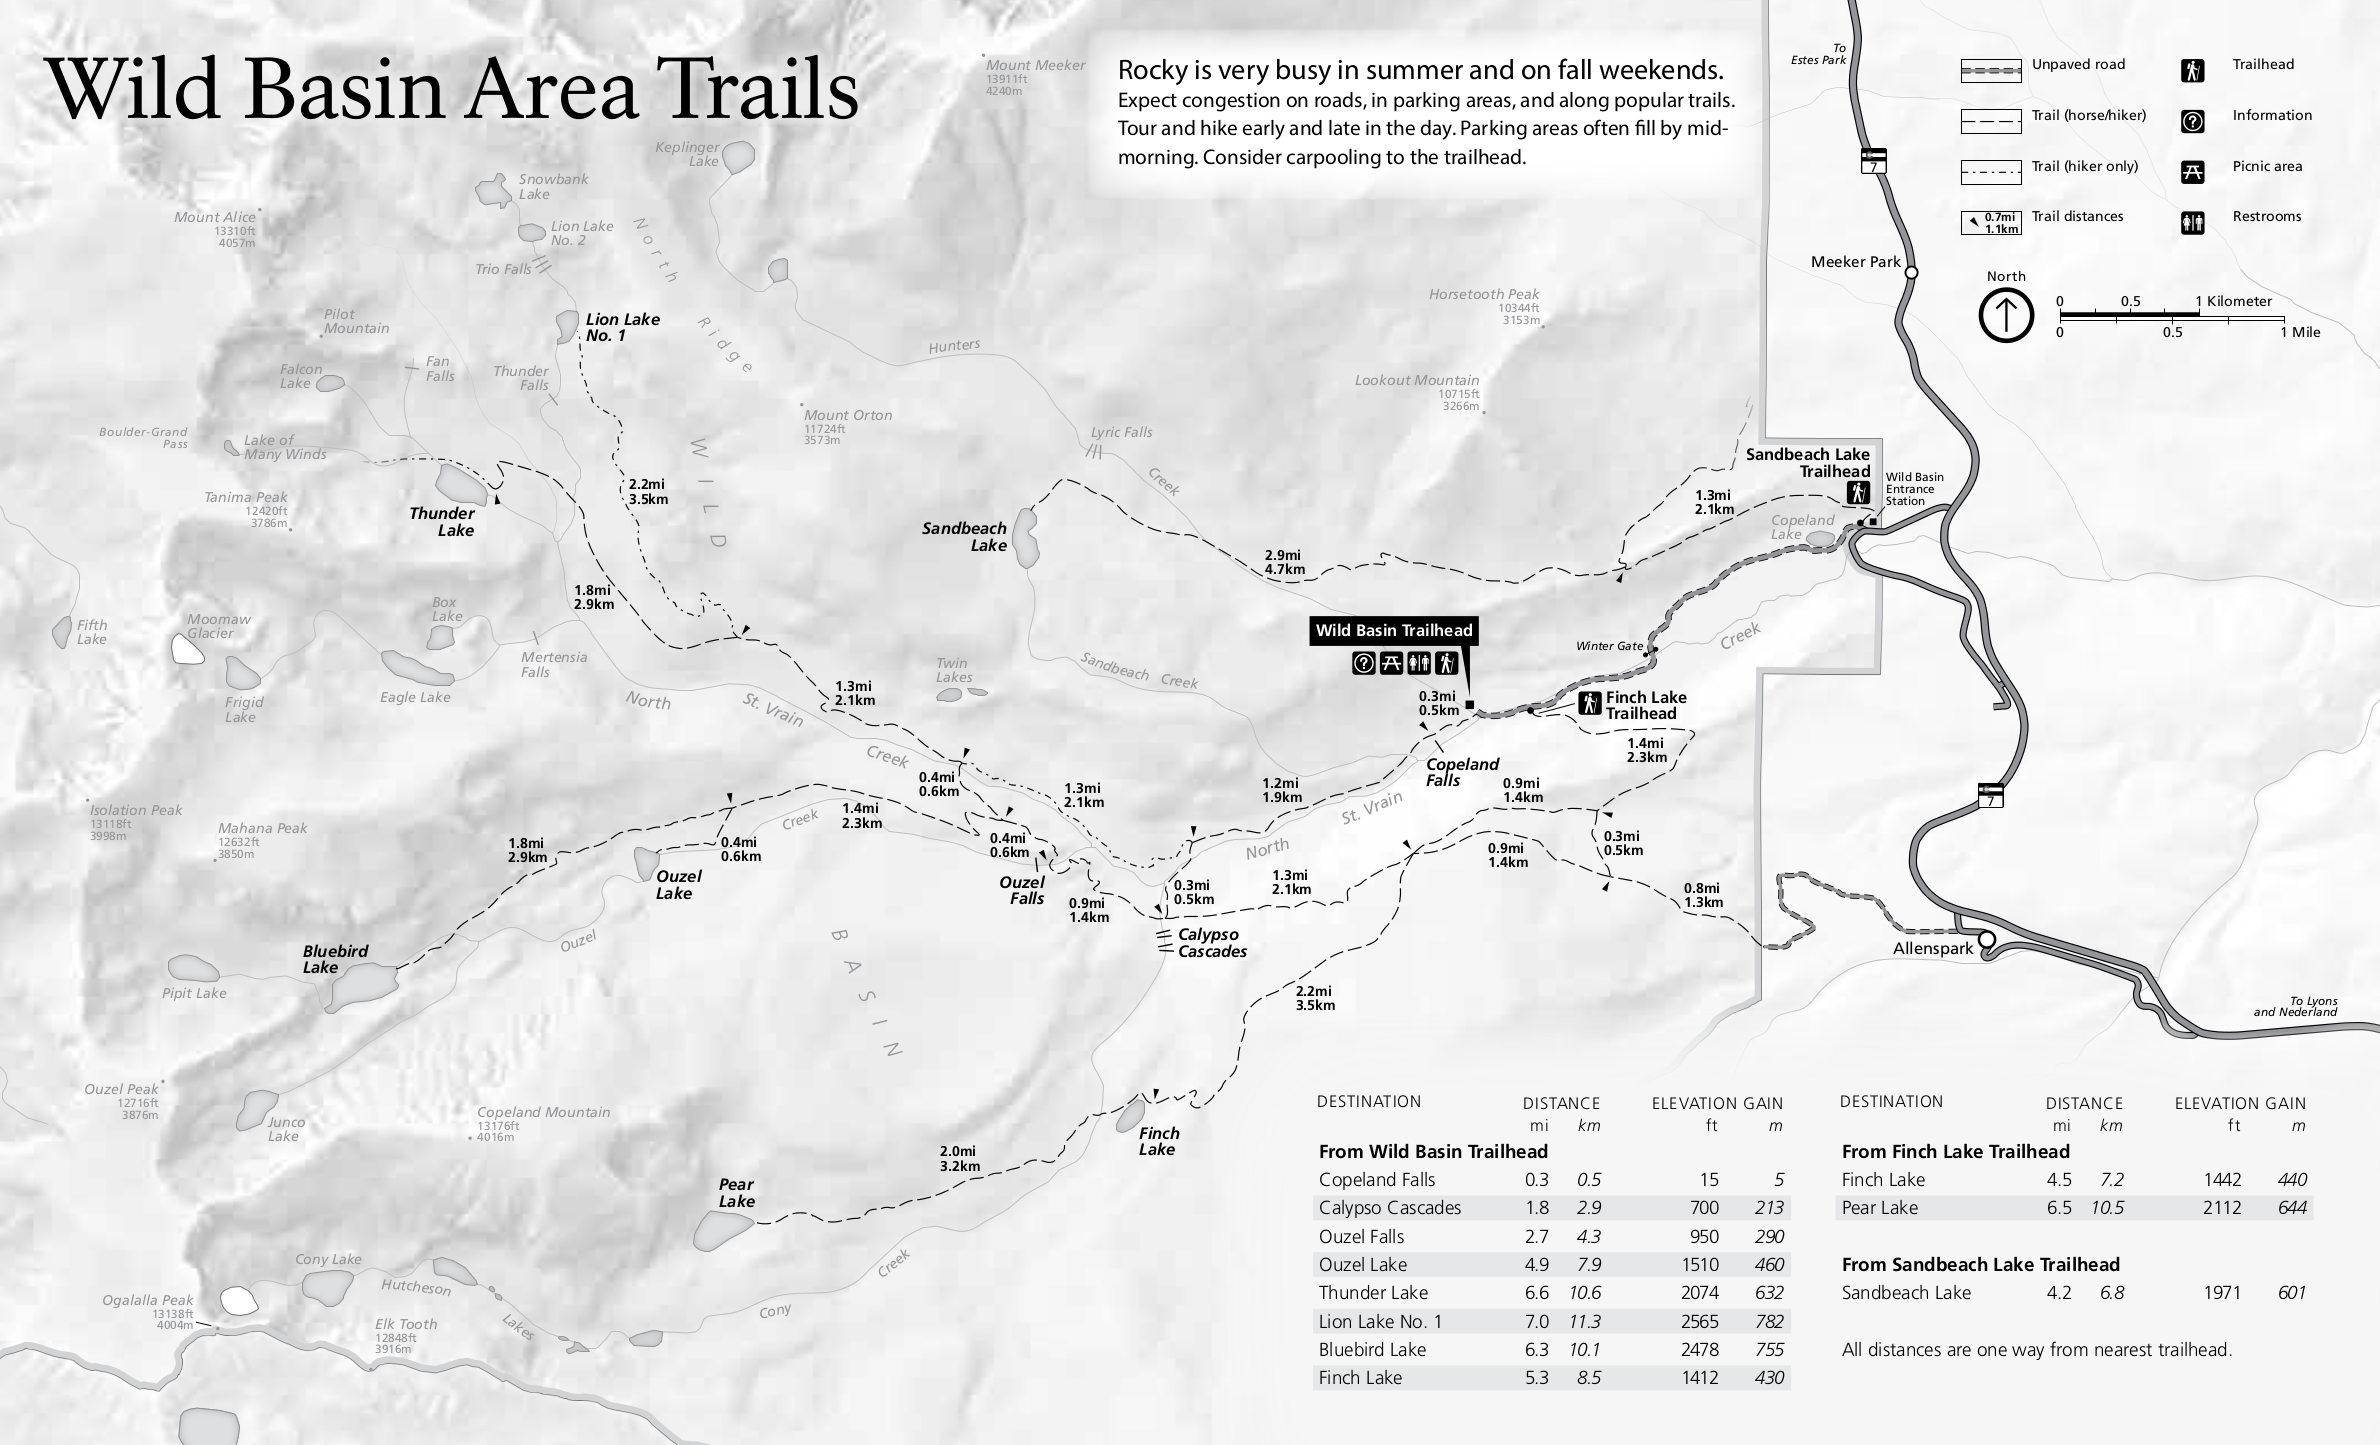 File:NPS rocky-mountain-wild-basin-trail-map.jpg - Wikimedia Commons